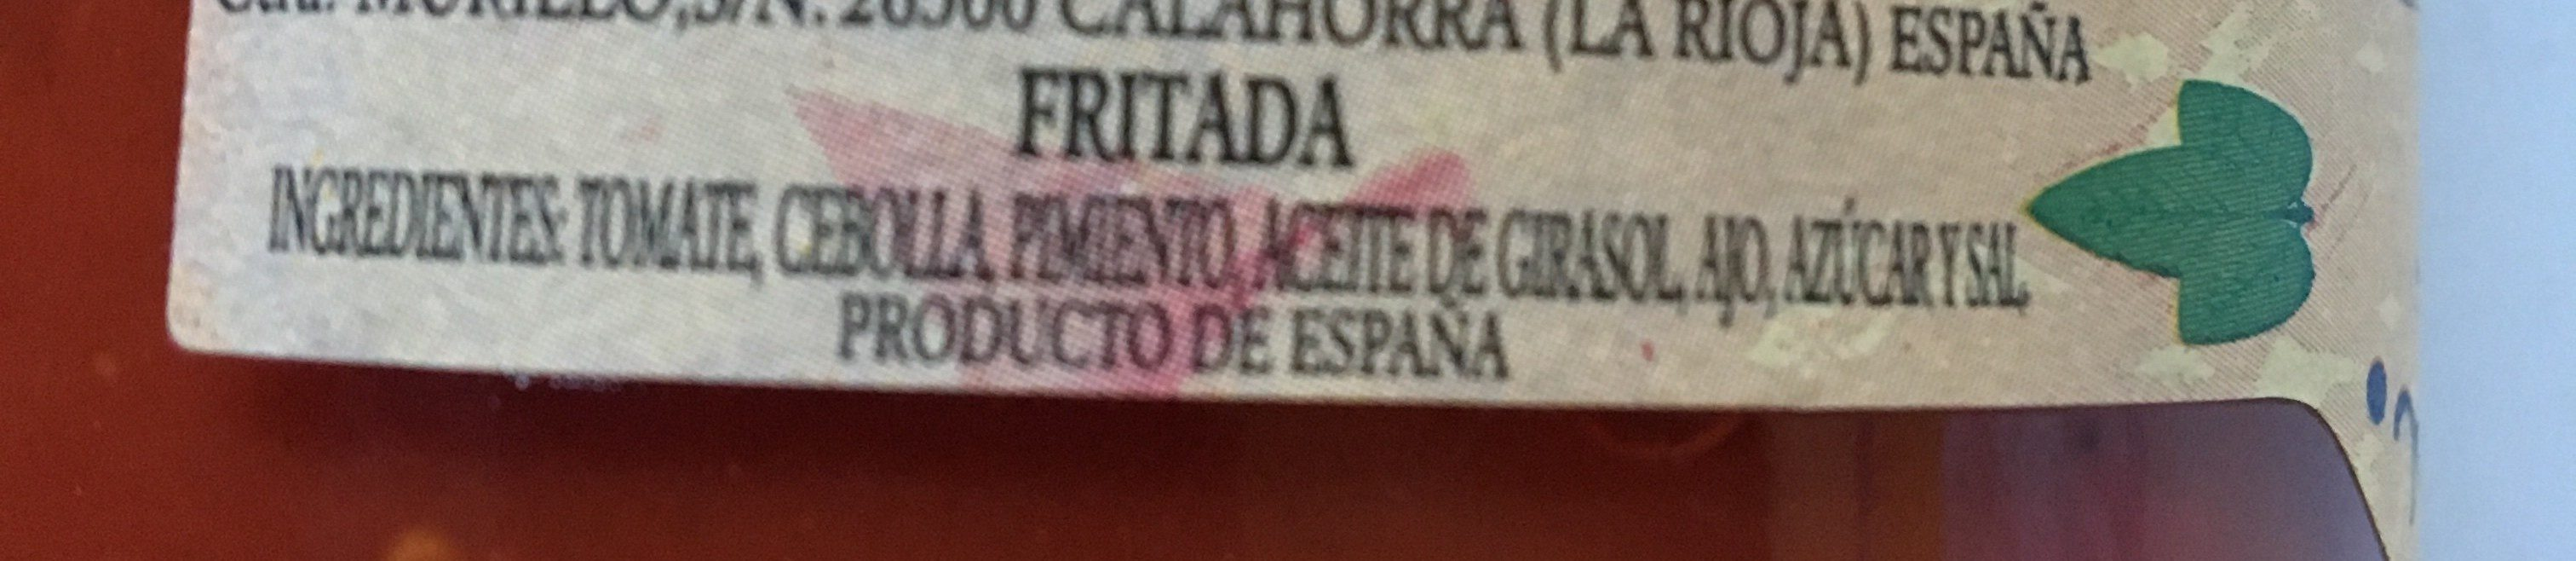 Fritada - Ingrédients